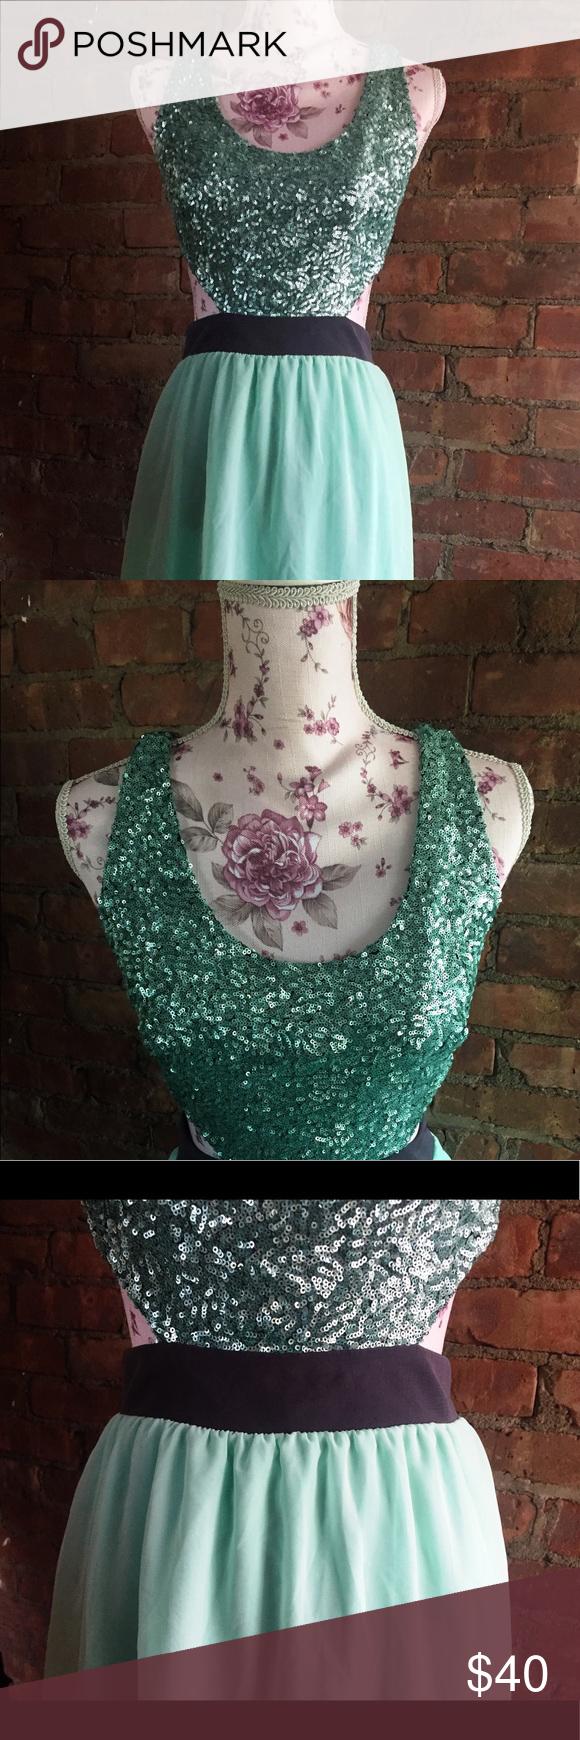 Modcloth sea foam green sequined mermaid dress A dress fit for a mermaid!! ✩ gorgeous sea foam green...